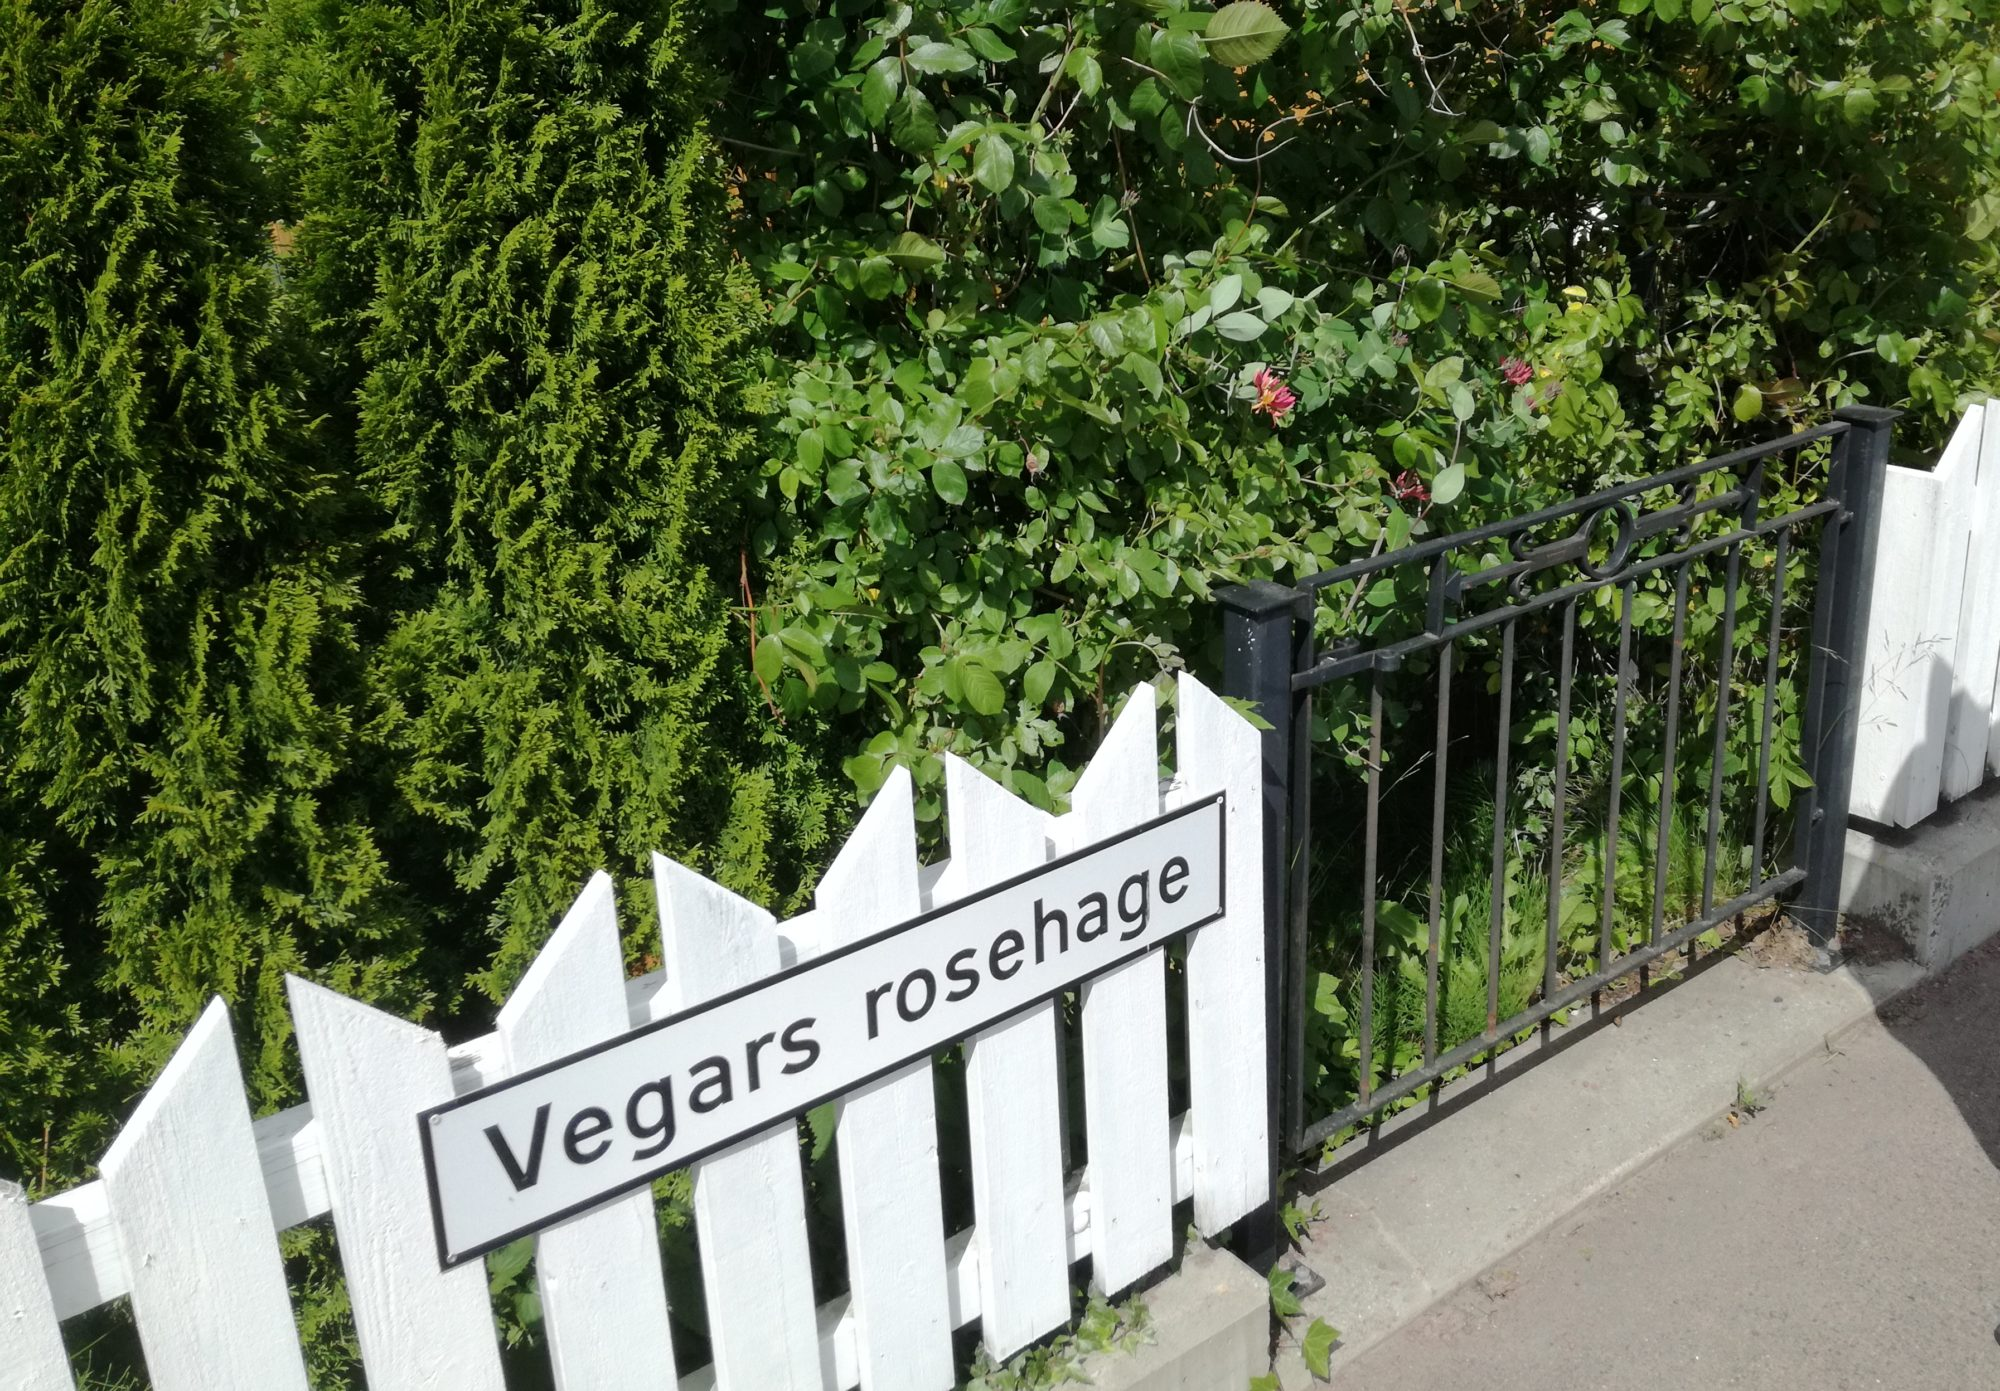 Vegars rosehage